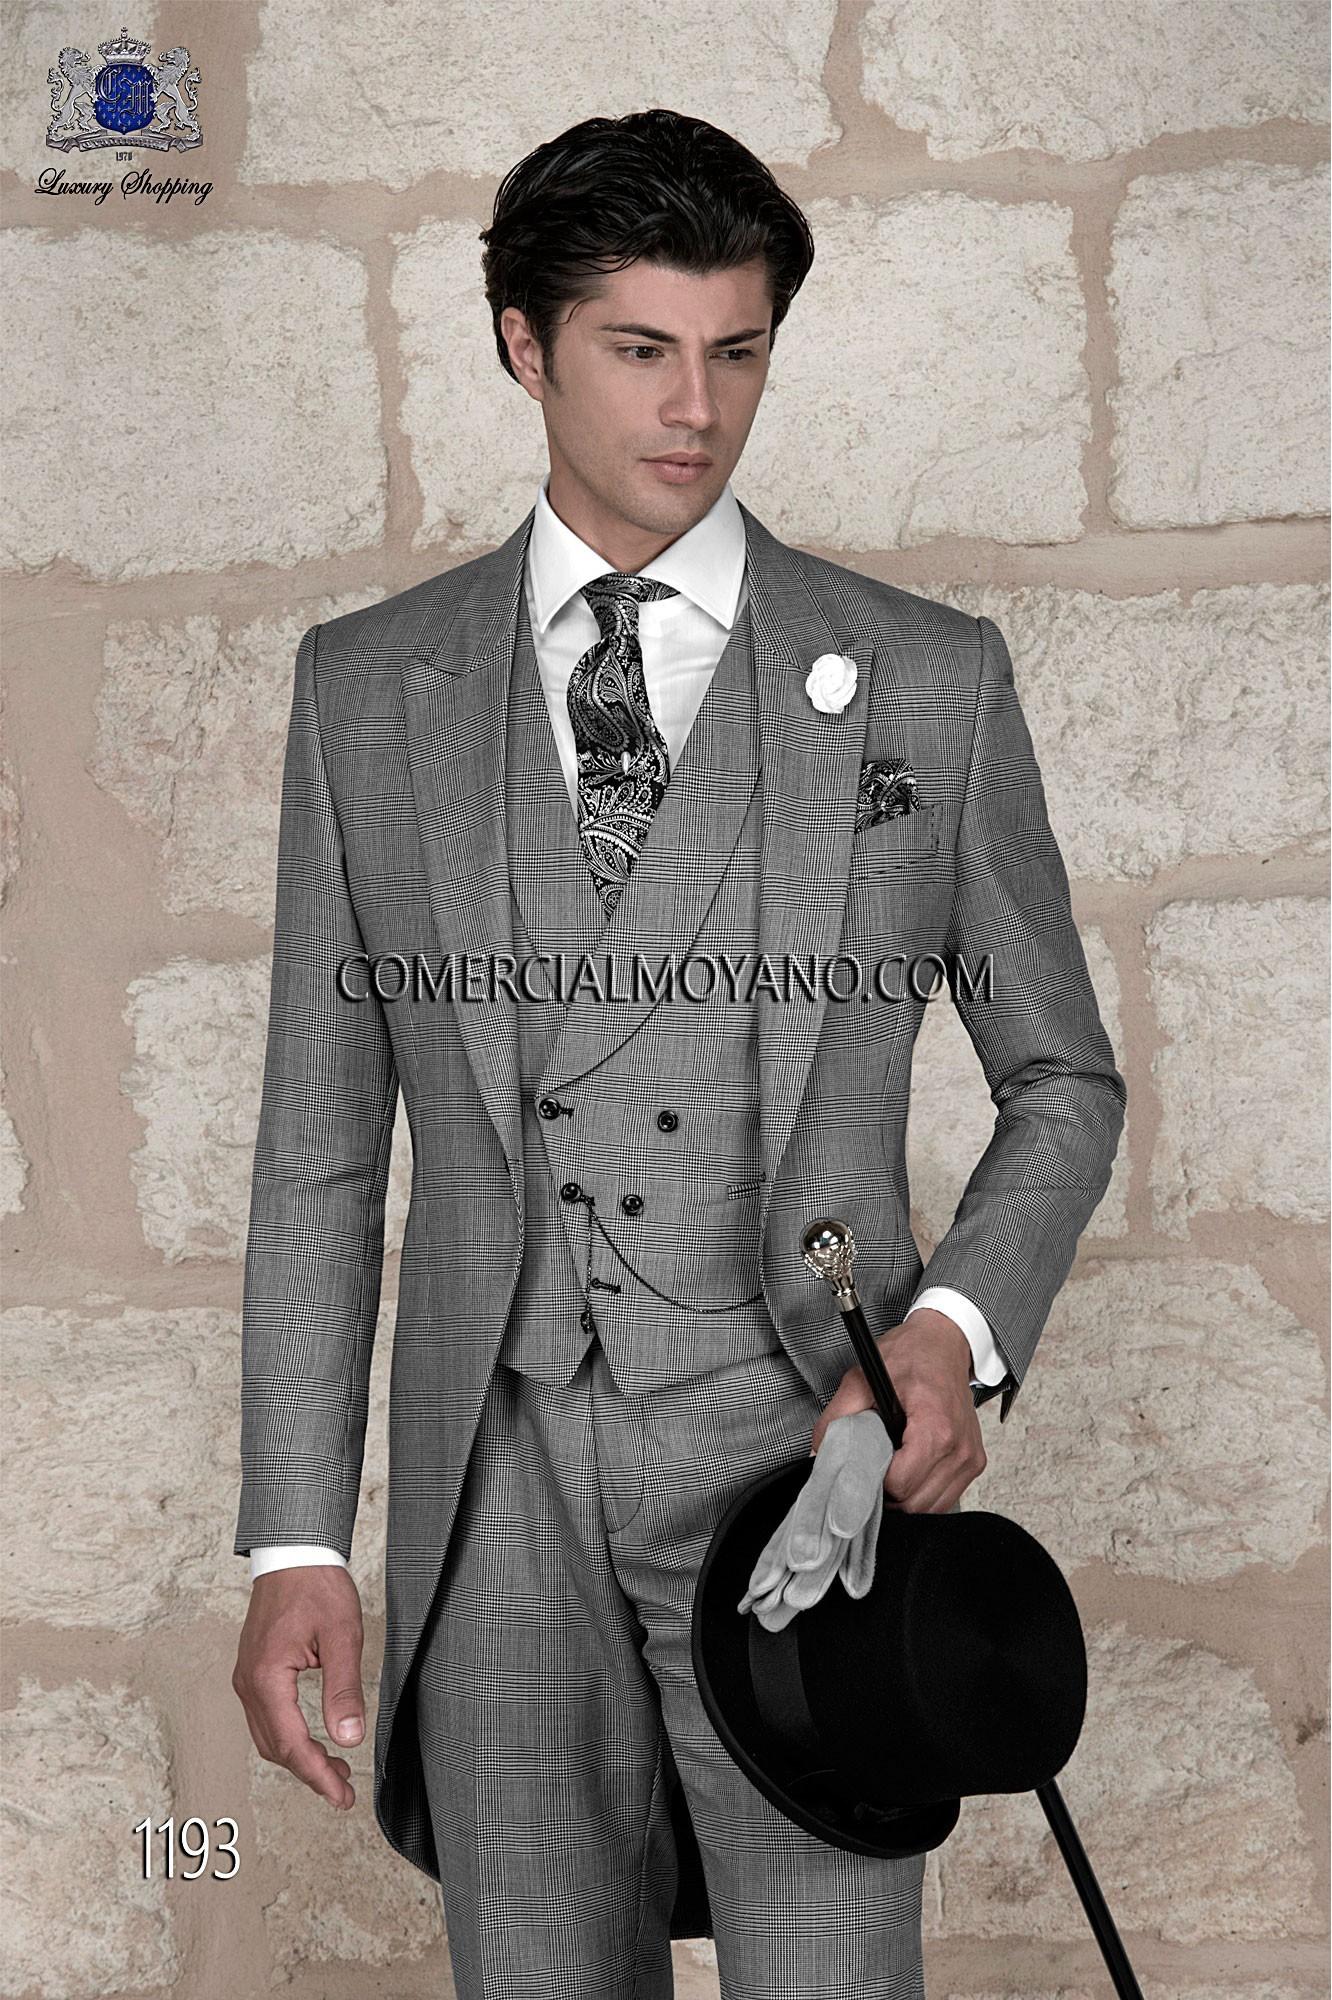 Italienne costume sur mesure mariage du matin, Prince de Galles, le style 1193 Ottavio Nuccio Gala, collection Gentleman.